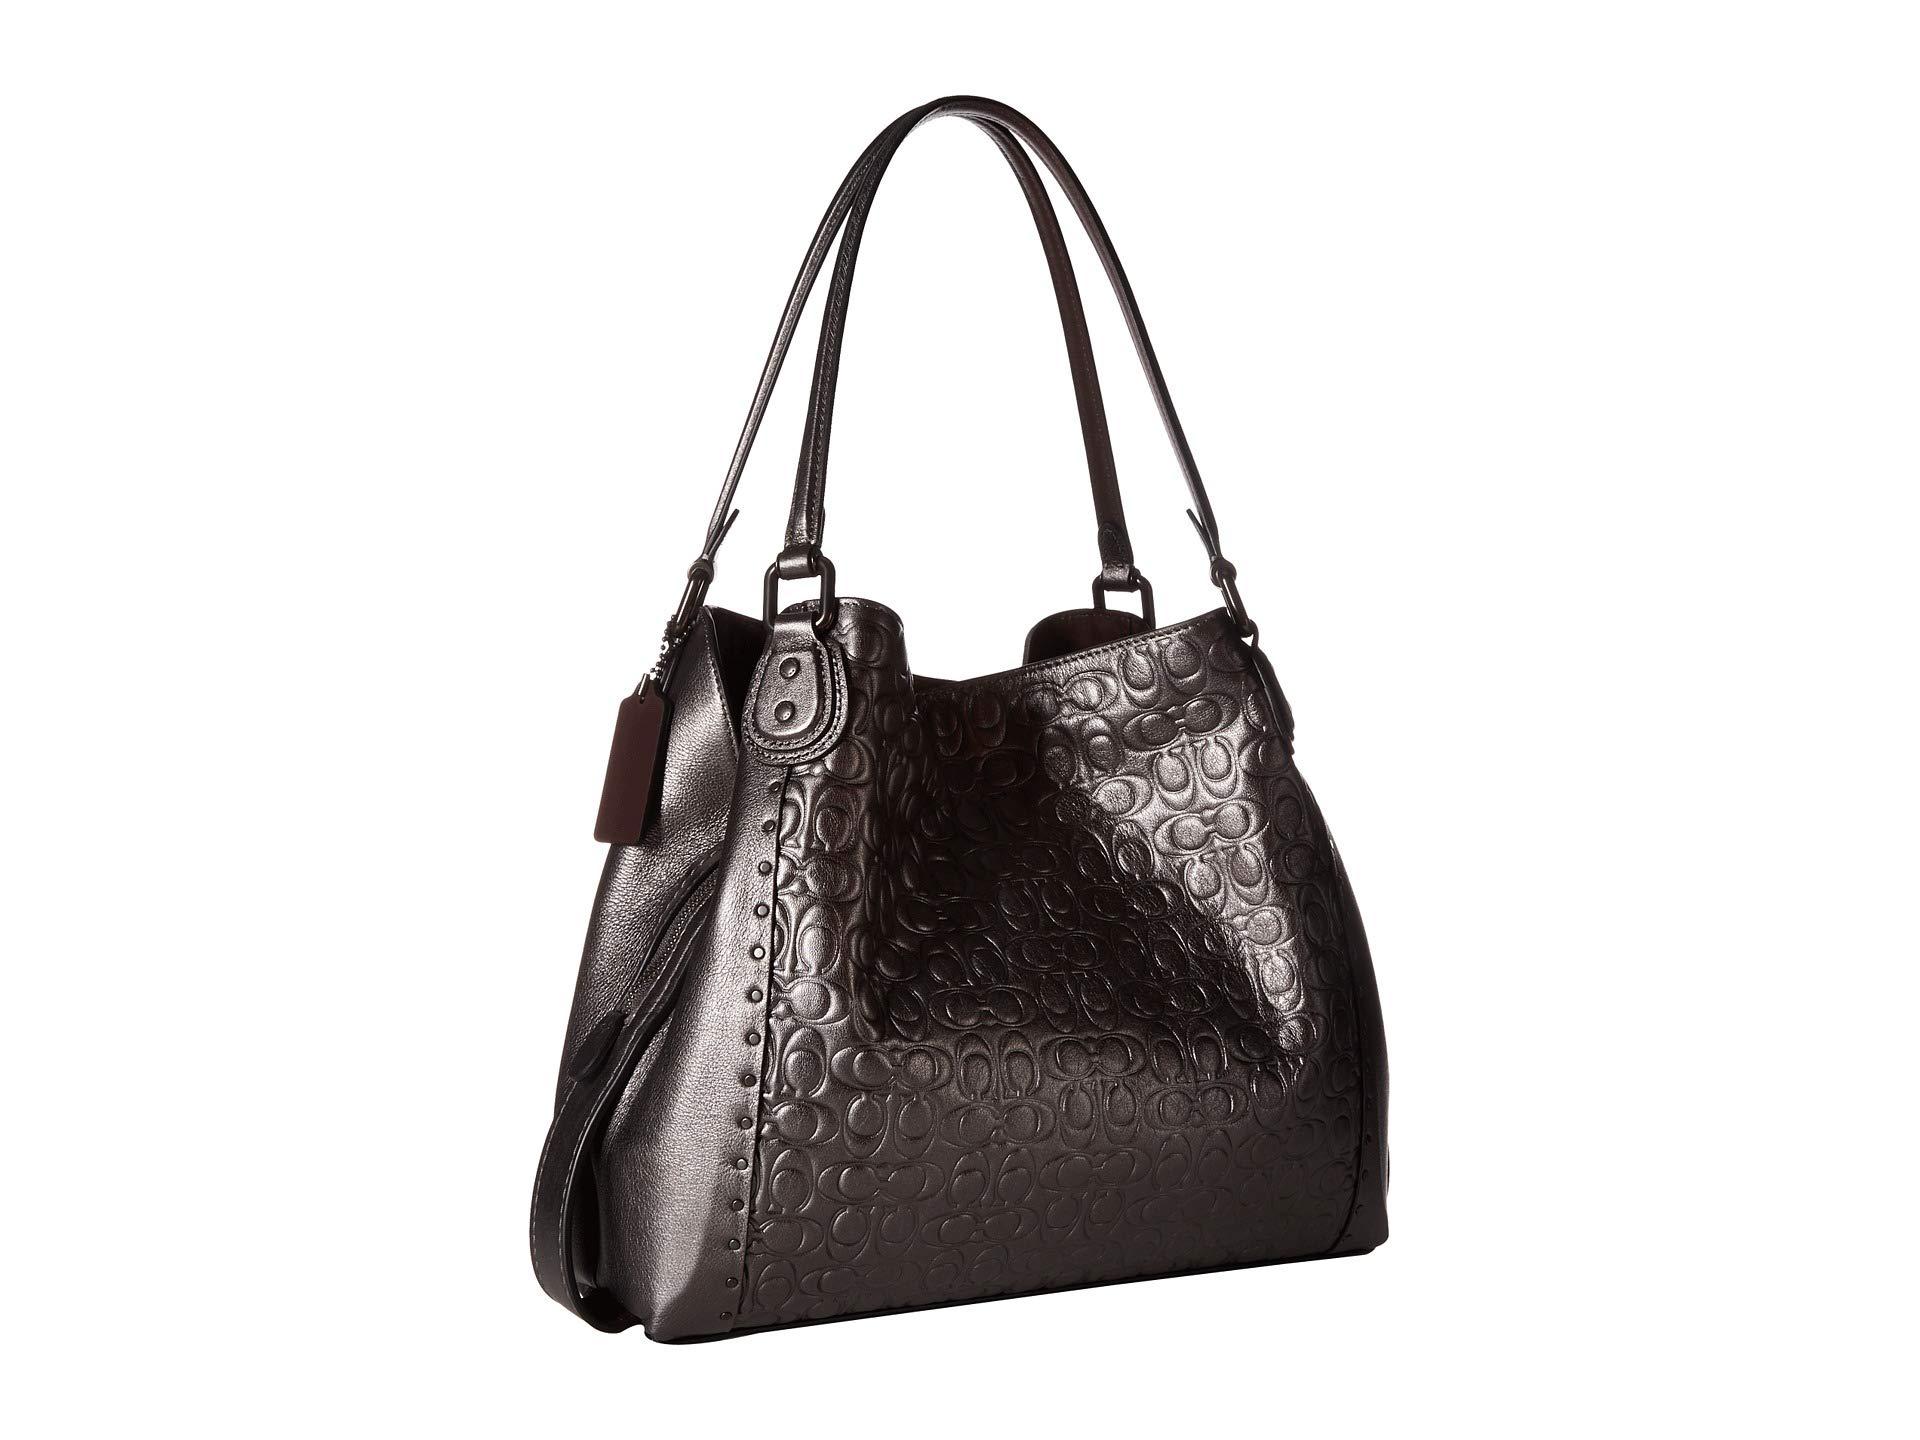 Border Graphite Bag metallic Metallic With Rivets Signature Shoulder Coach V5 Edie 31 Leather HpwOqZAS